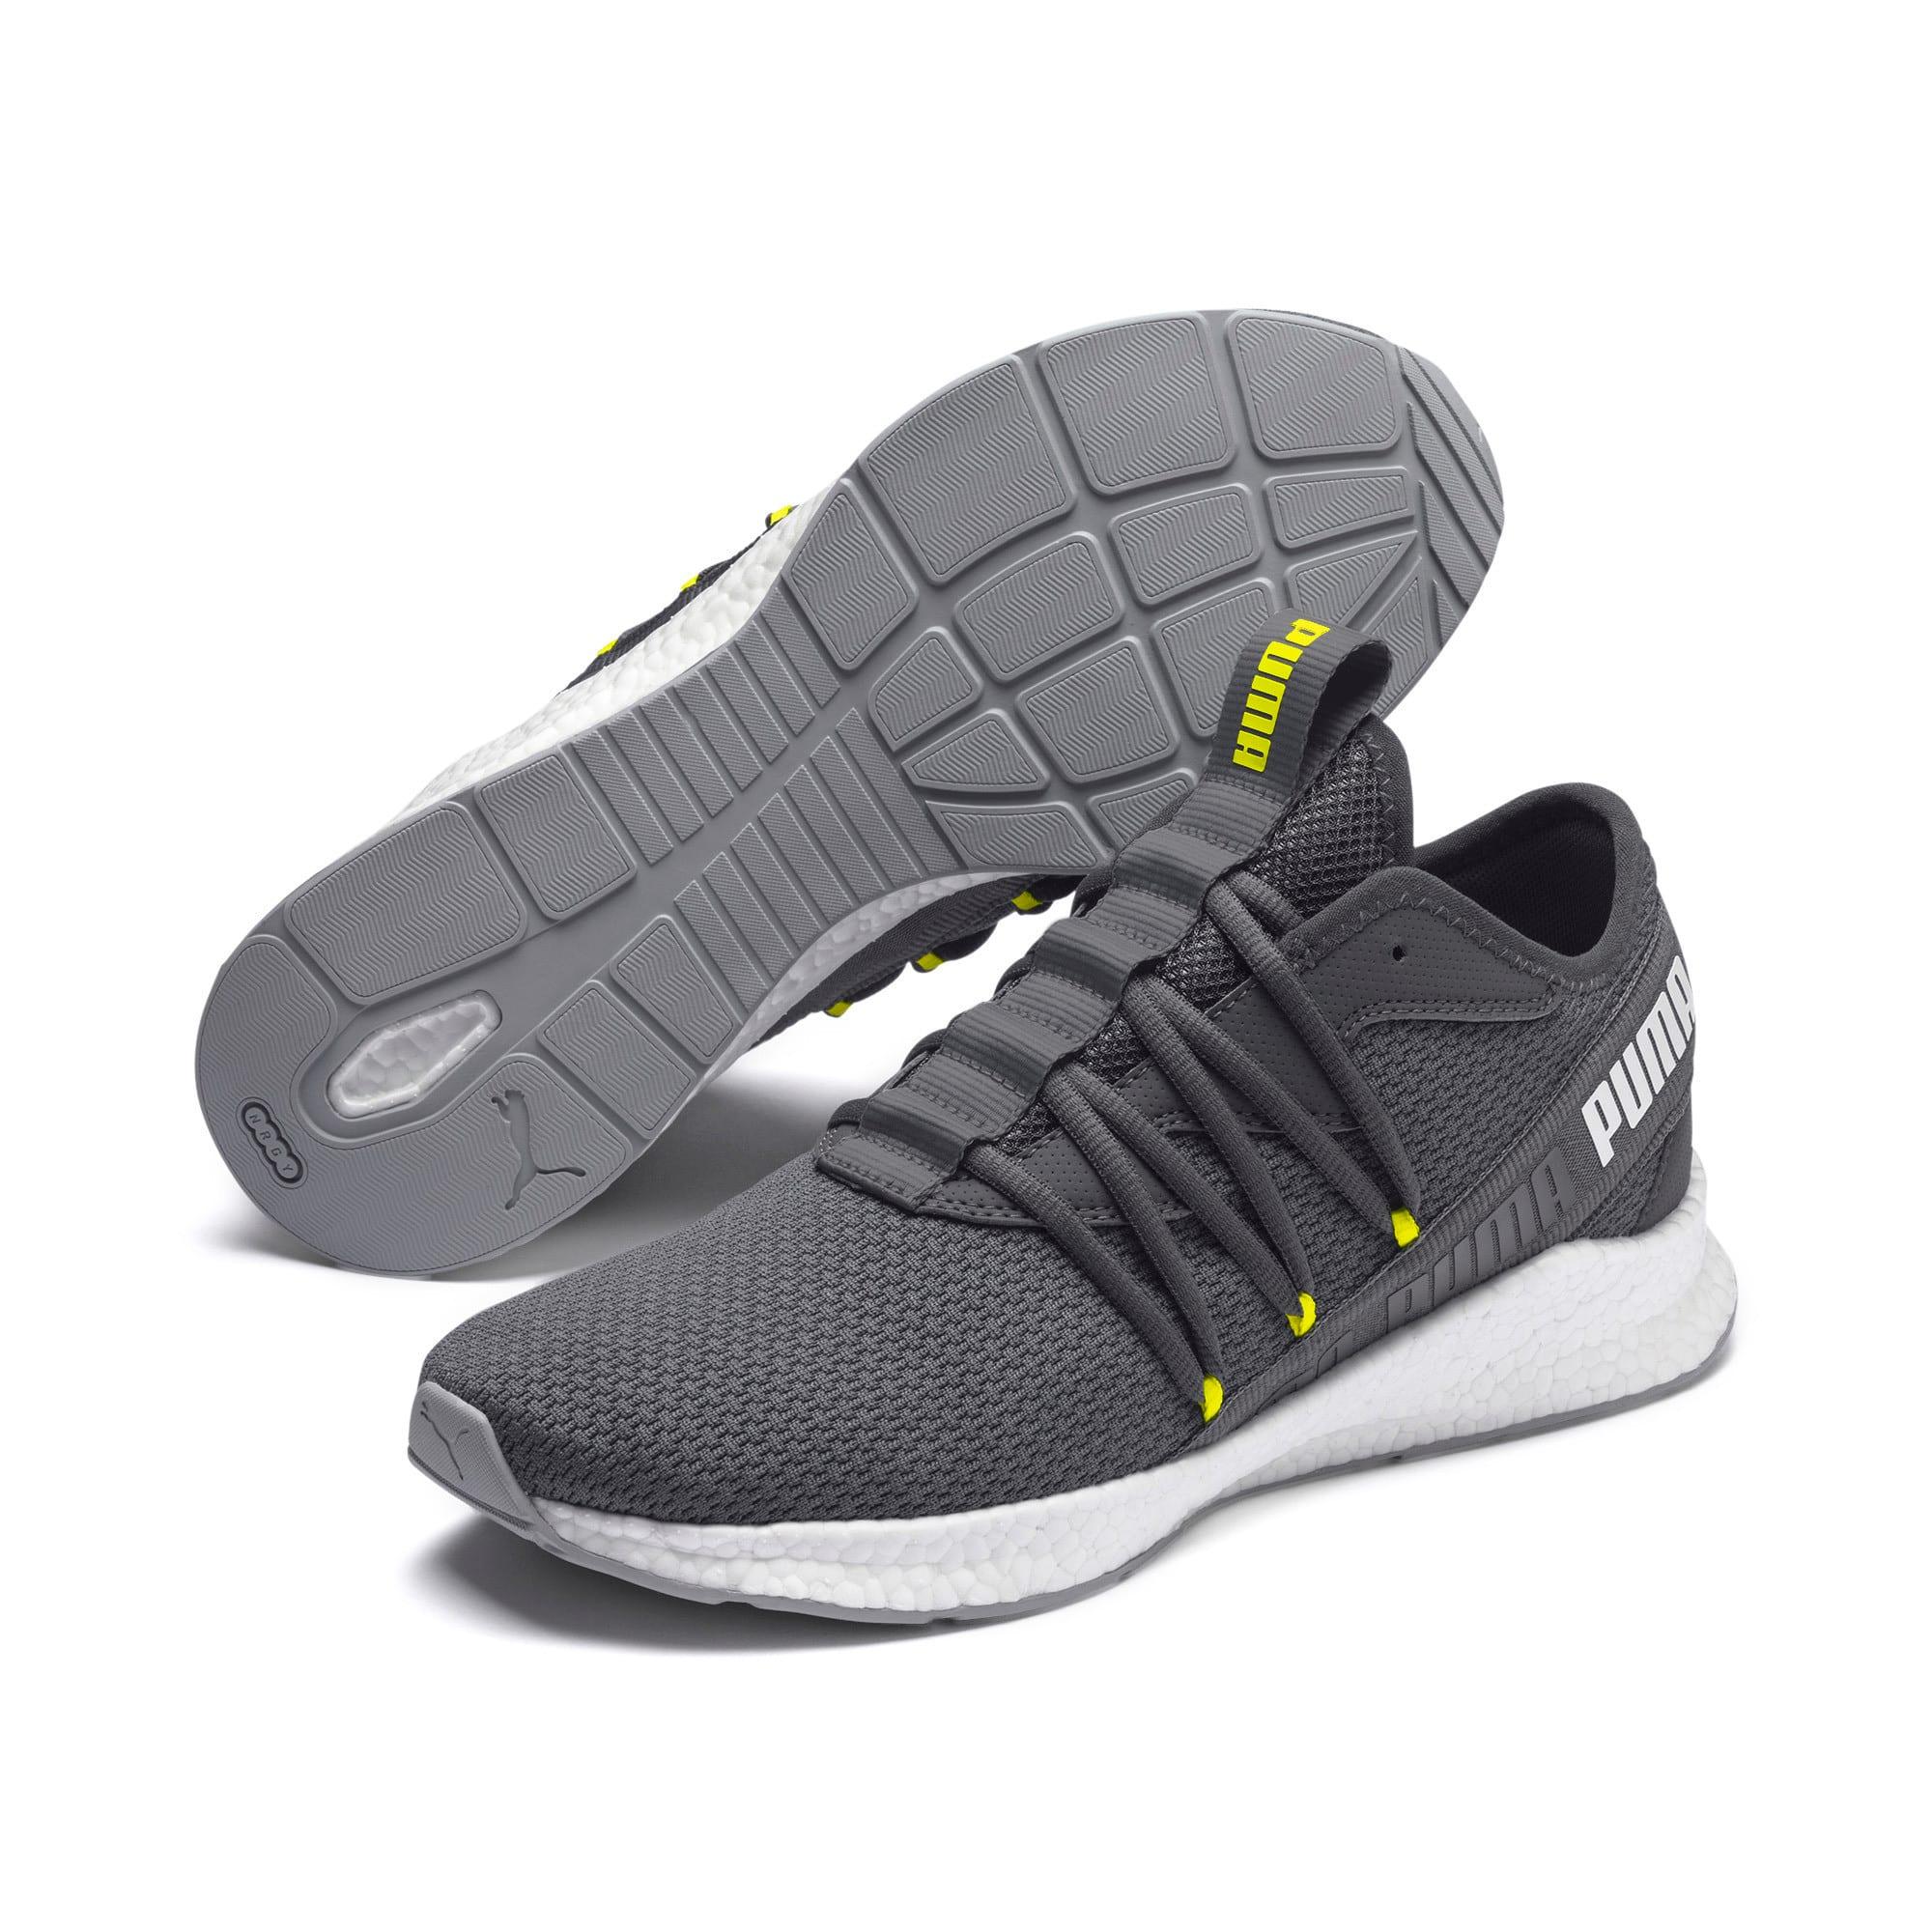 Thumbnail 3 of NRGY Star Running Shoes, CASTLEROCK-White-Yellow, medium